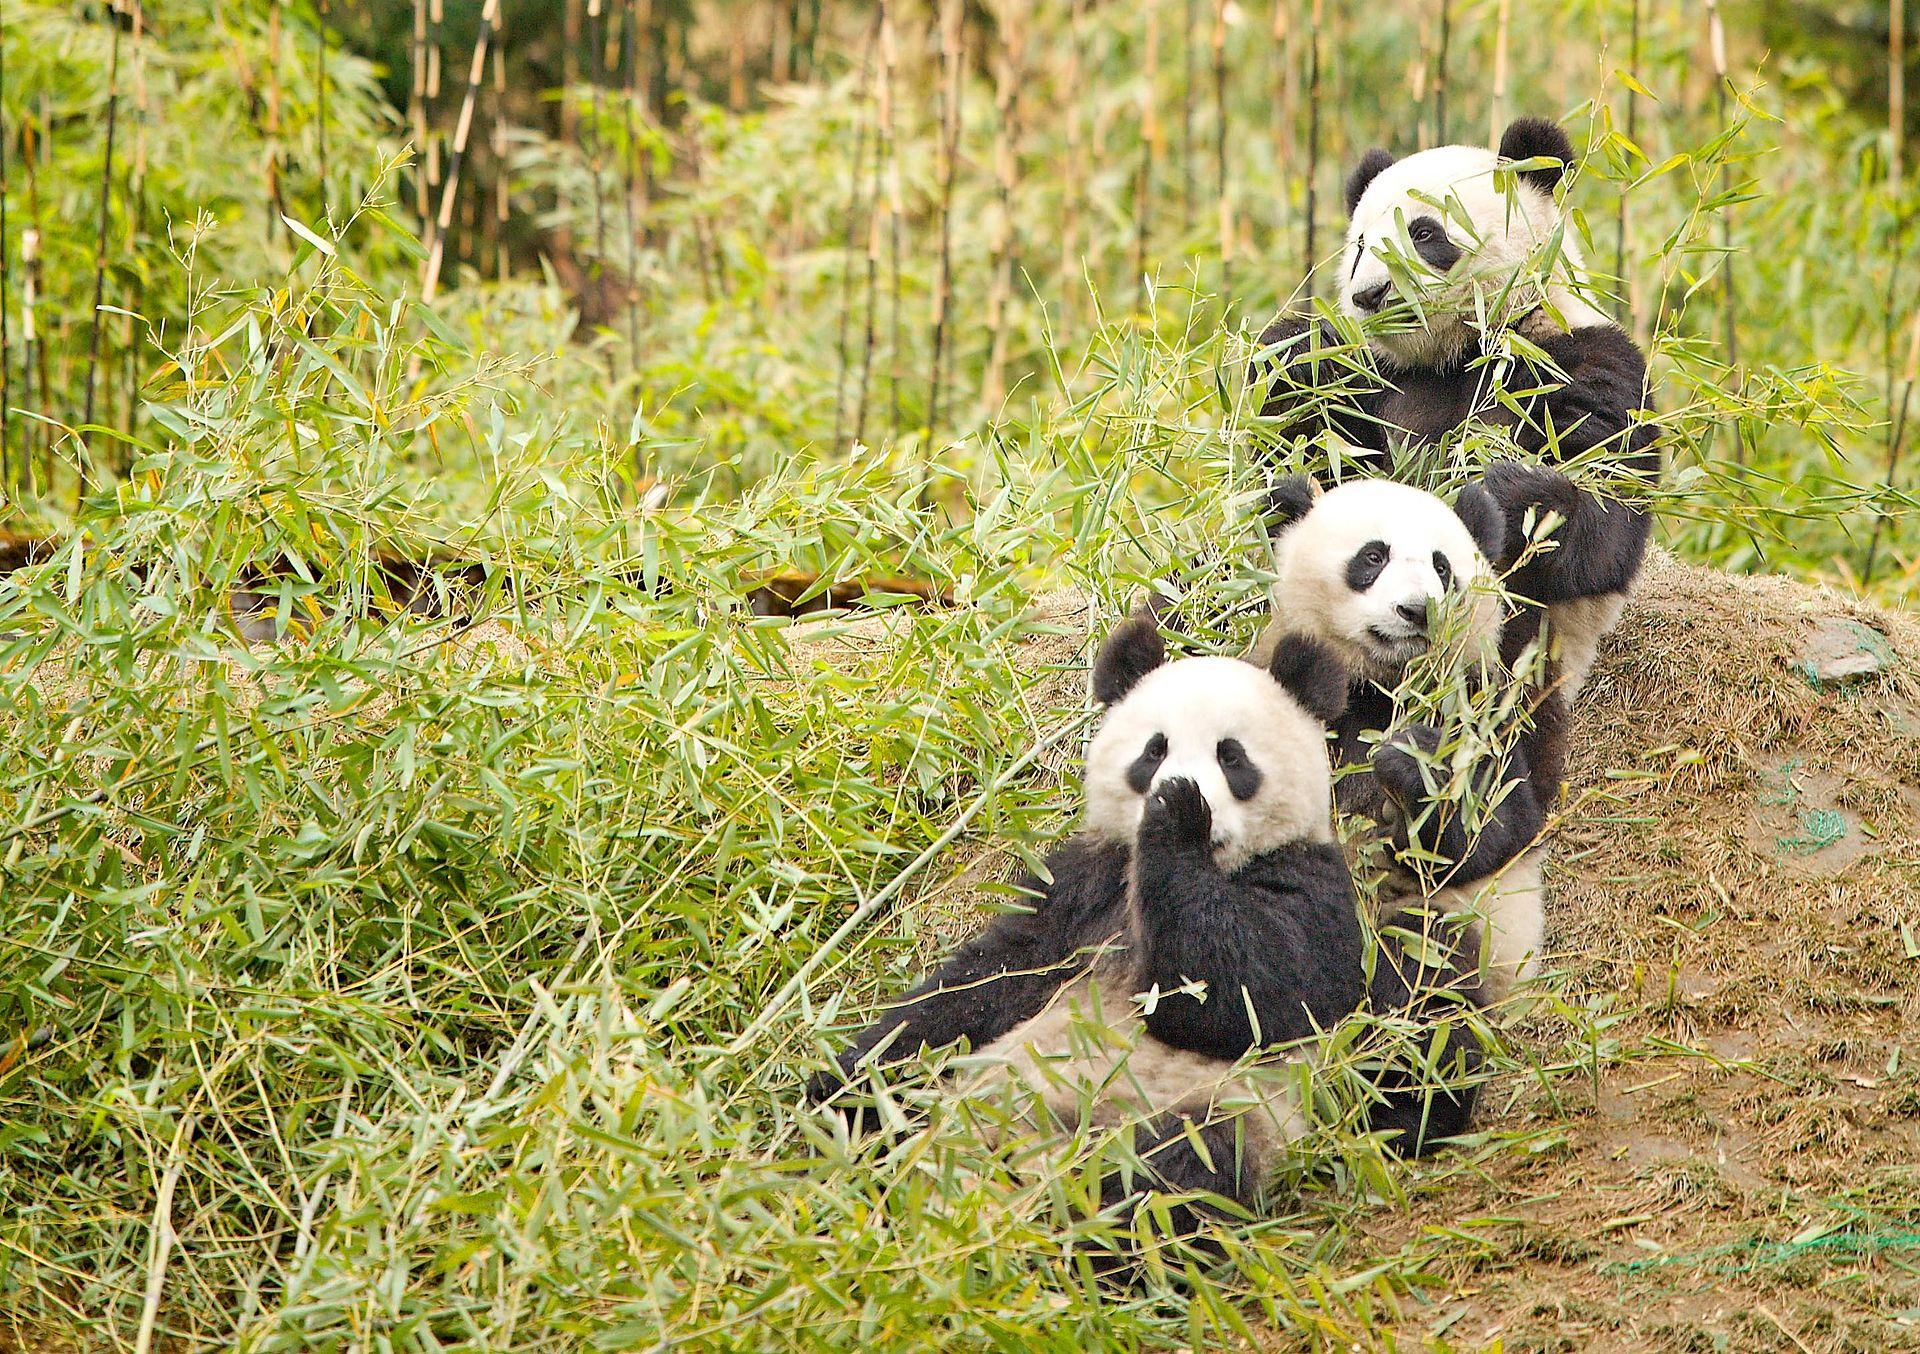 velike pande